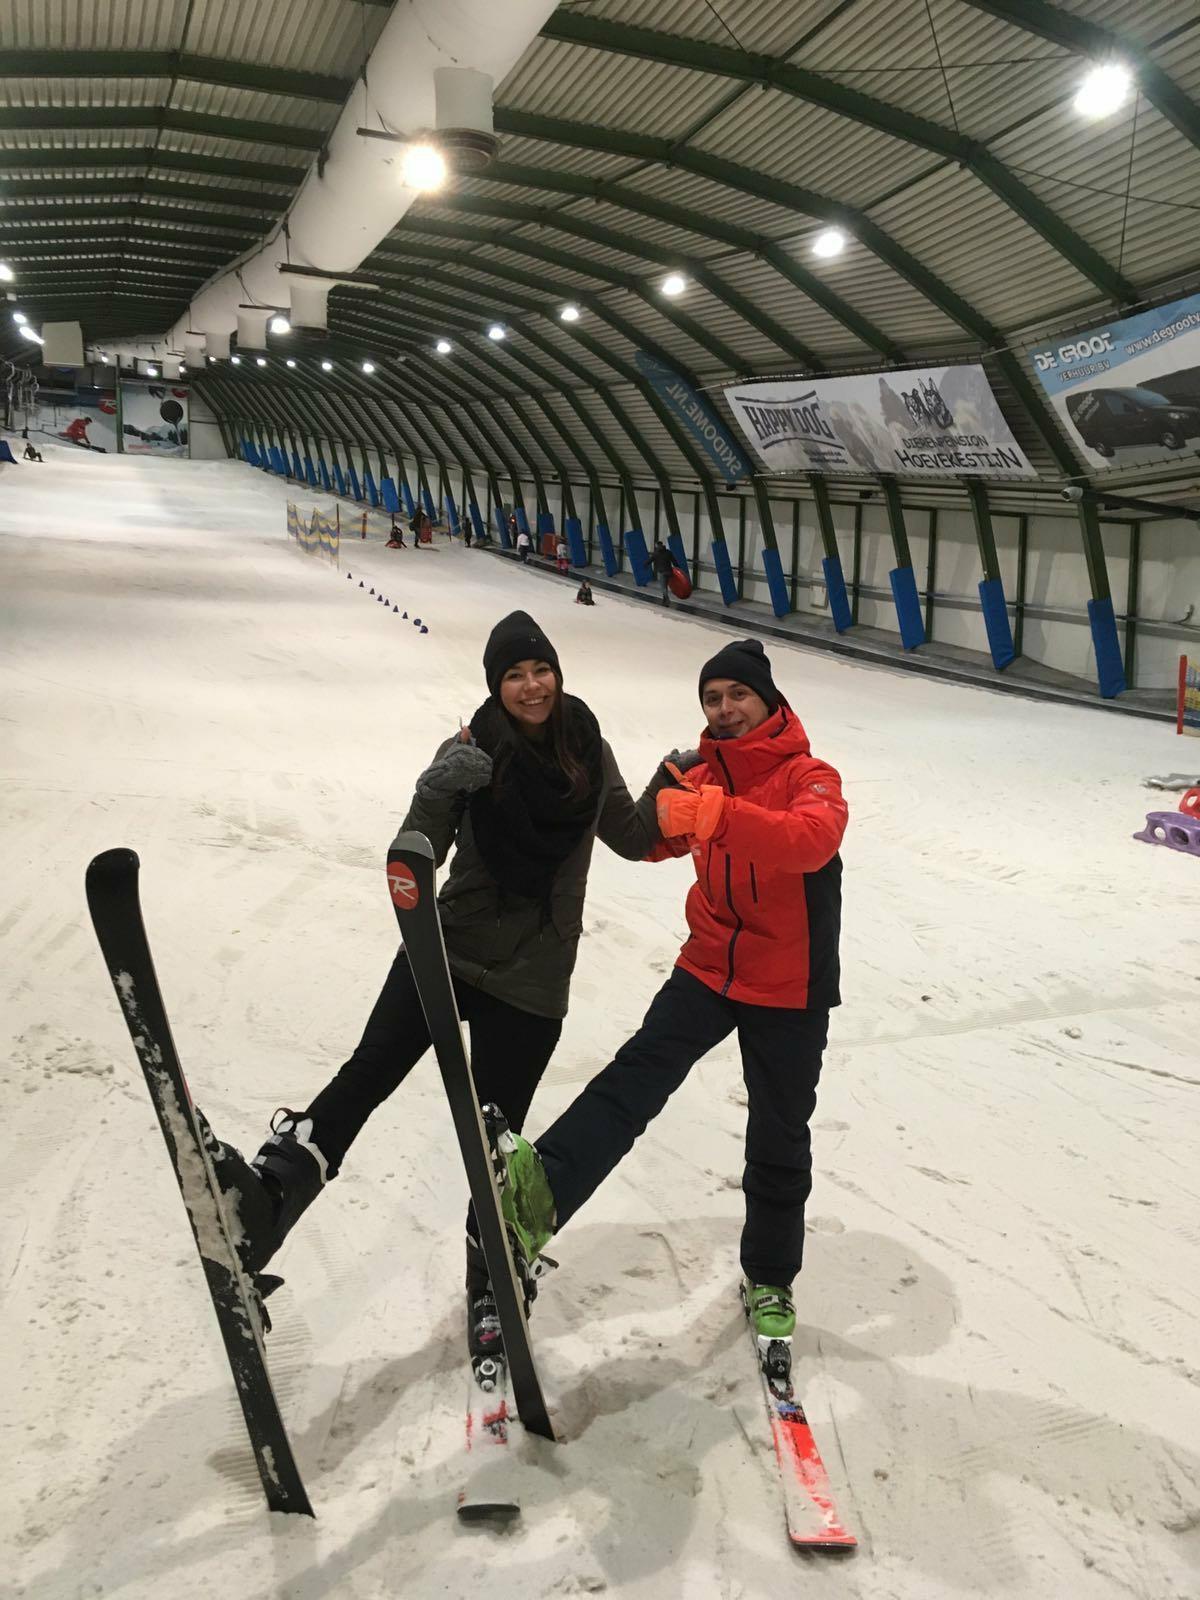 Yvonne Bierings skien